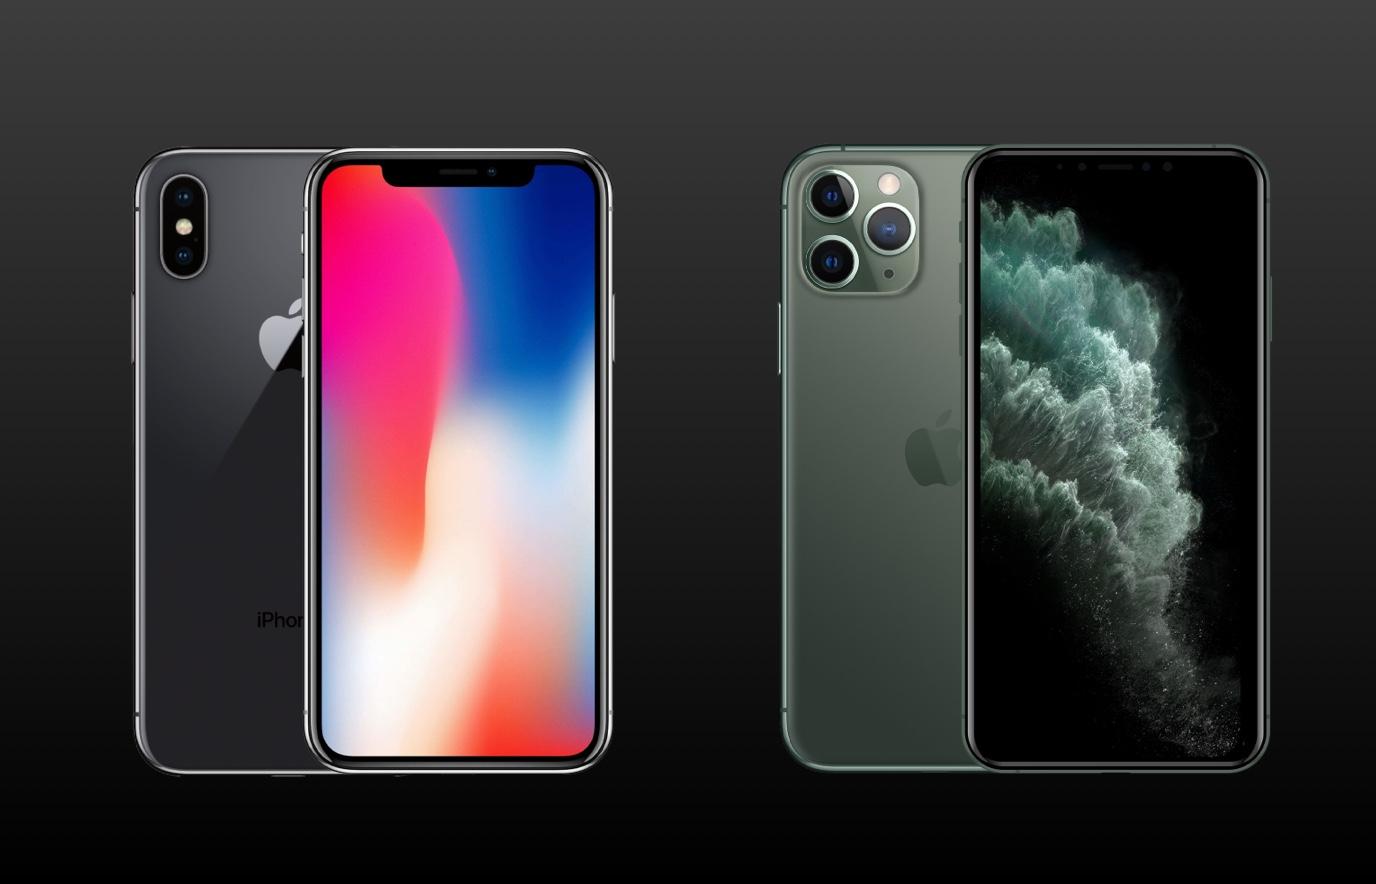 iPhone 11 Pro vs iPhone X